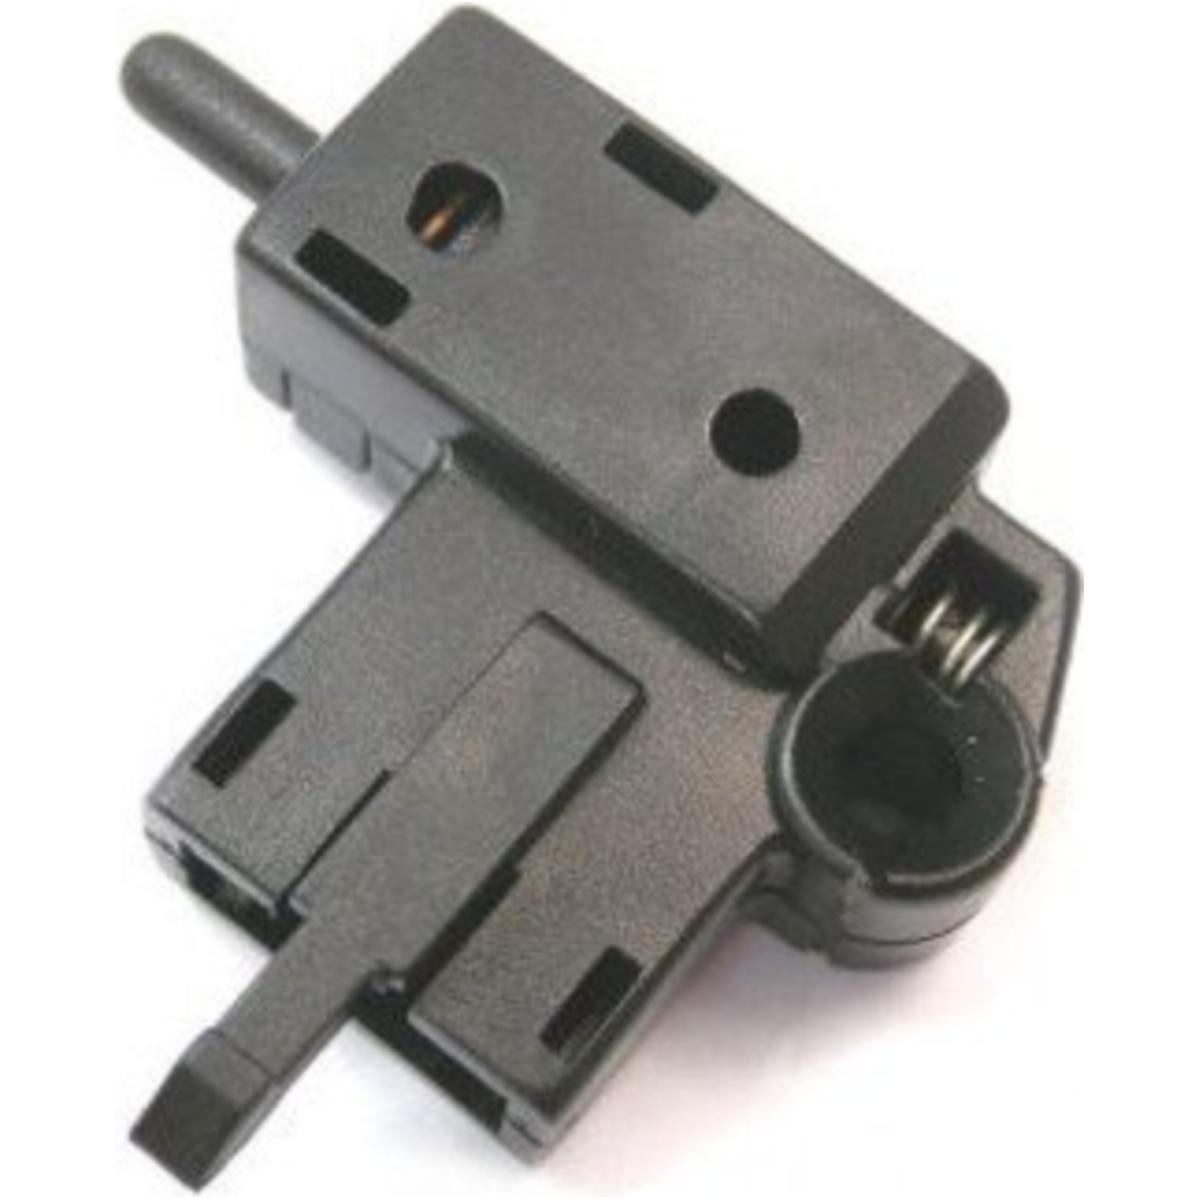 Clutch cut out switch jmp BD220072 Yamaha XVZ Royal Star 32410